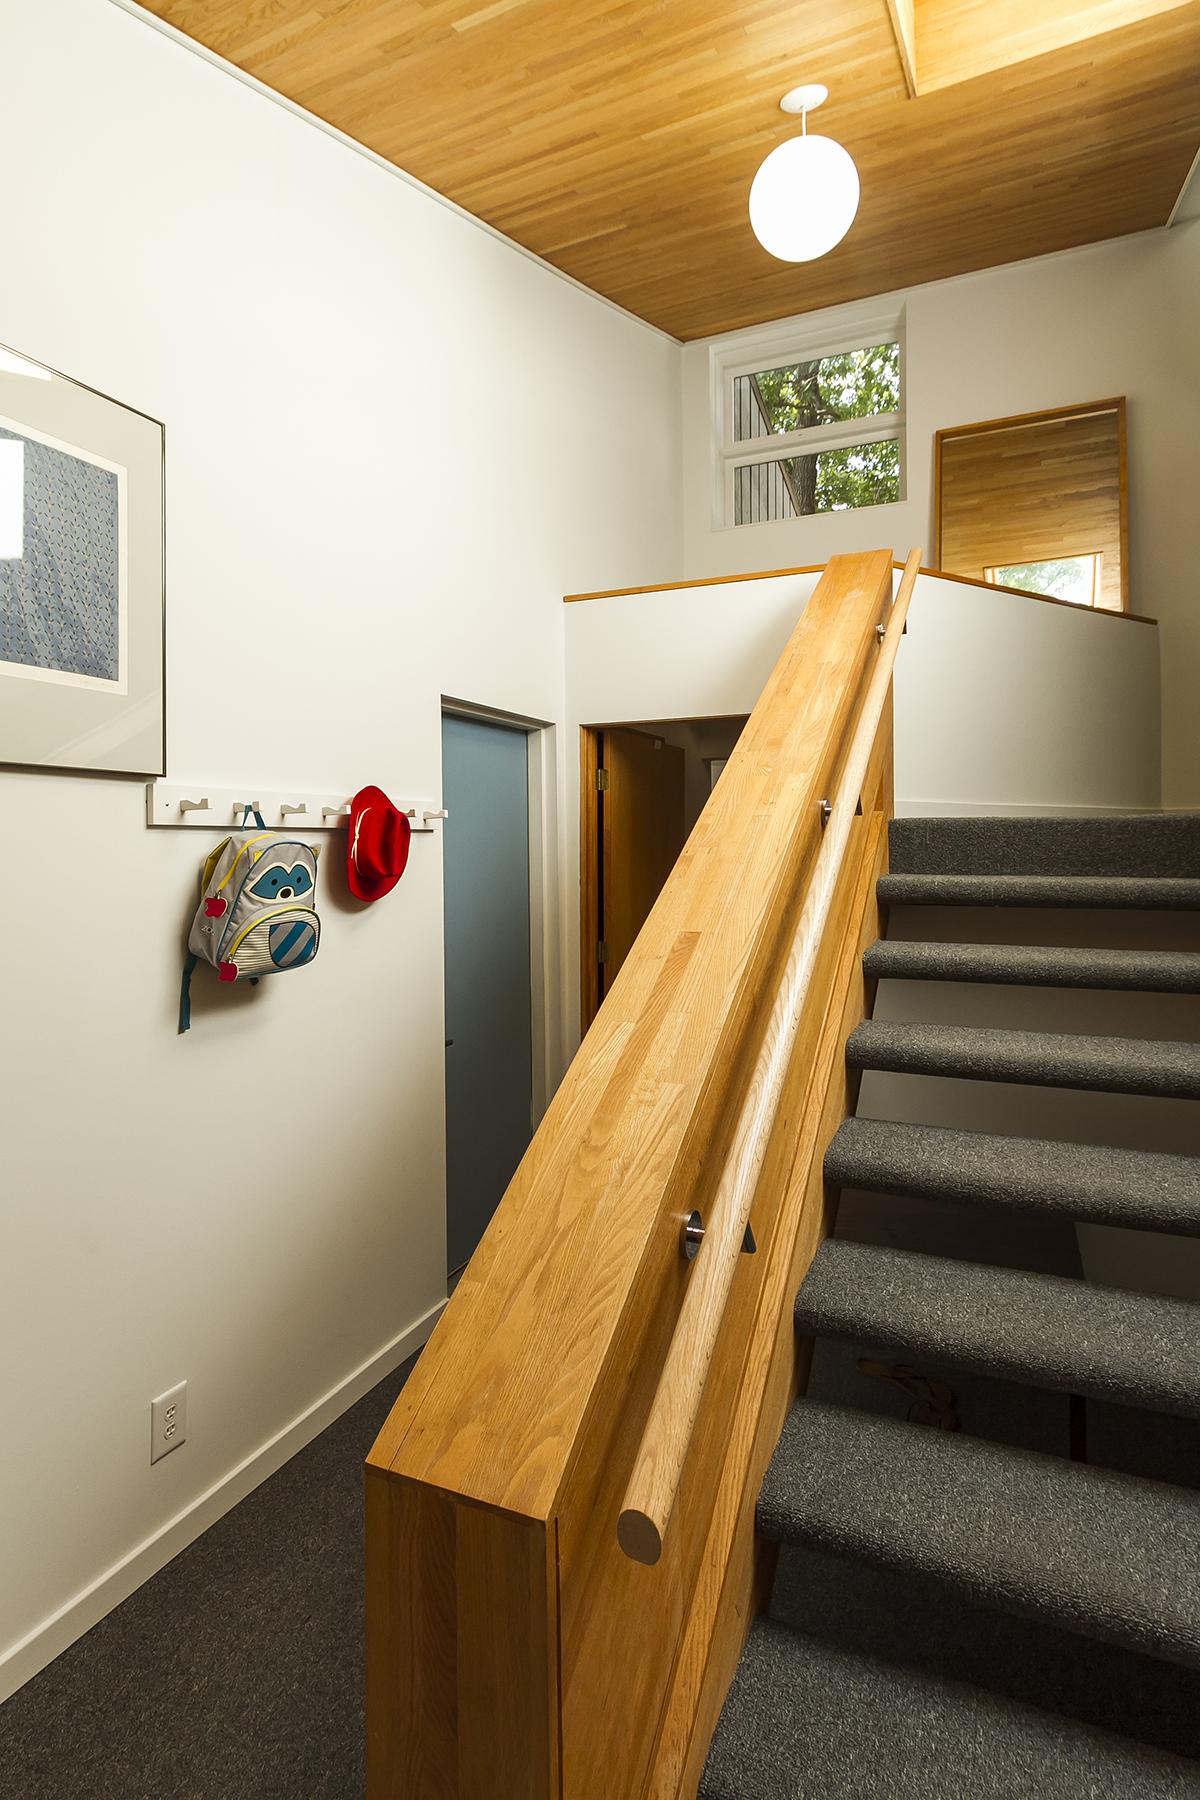 web_front stairwell.jpg